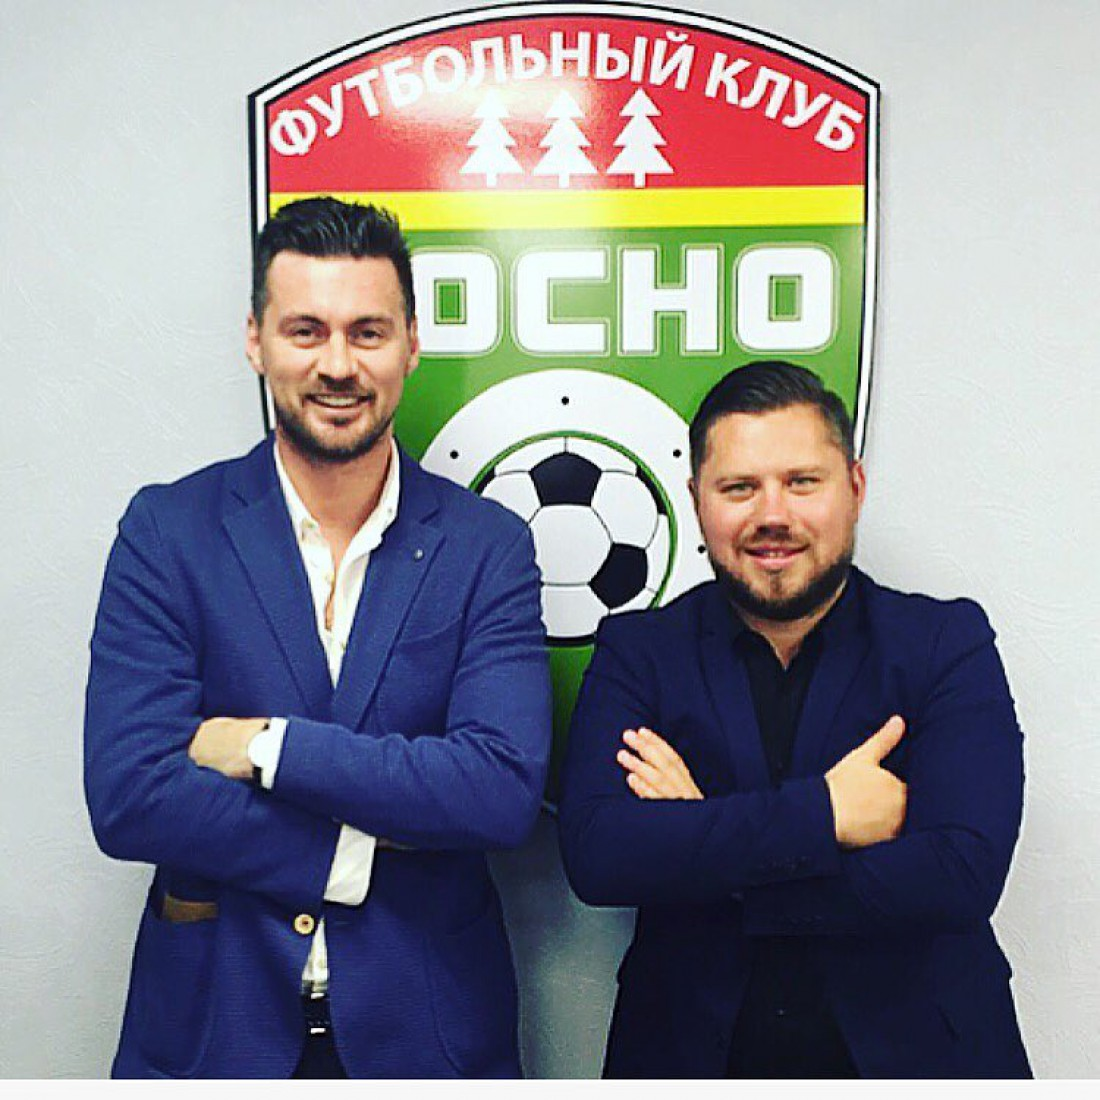 Артем Милевский и Александр Панков